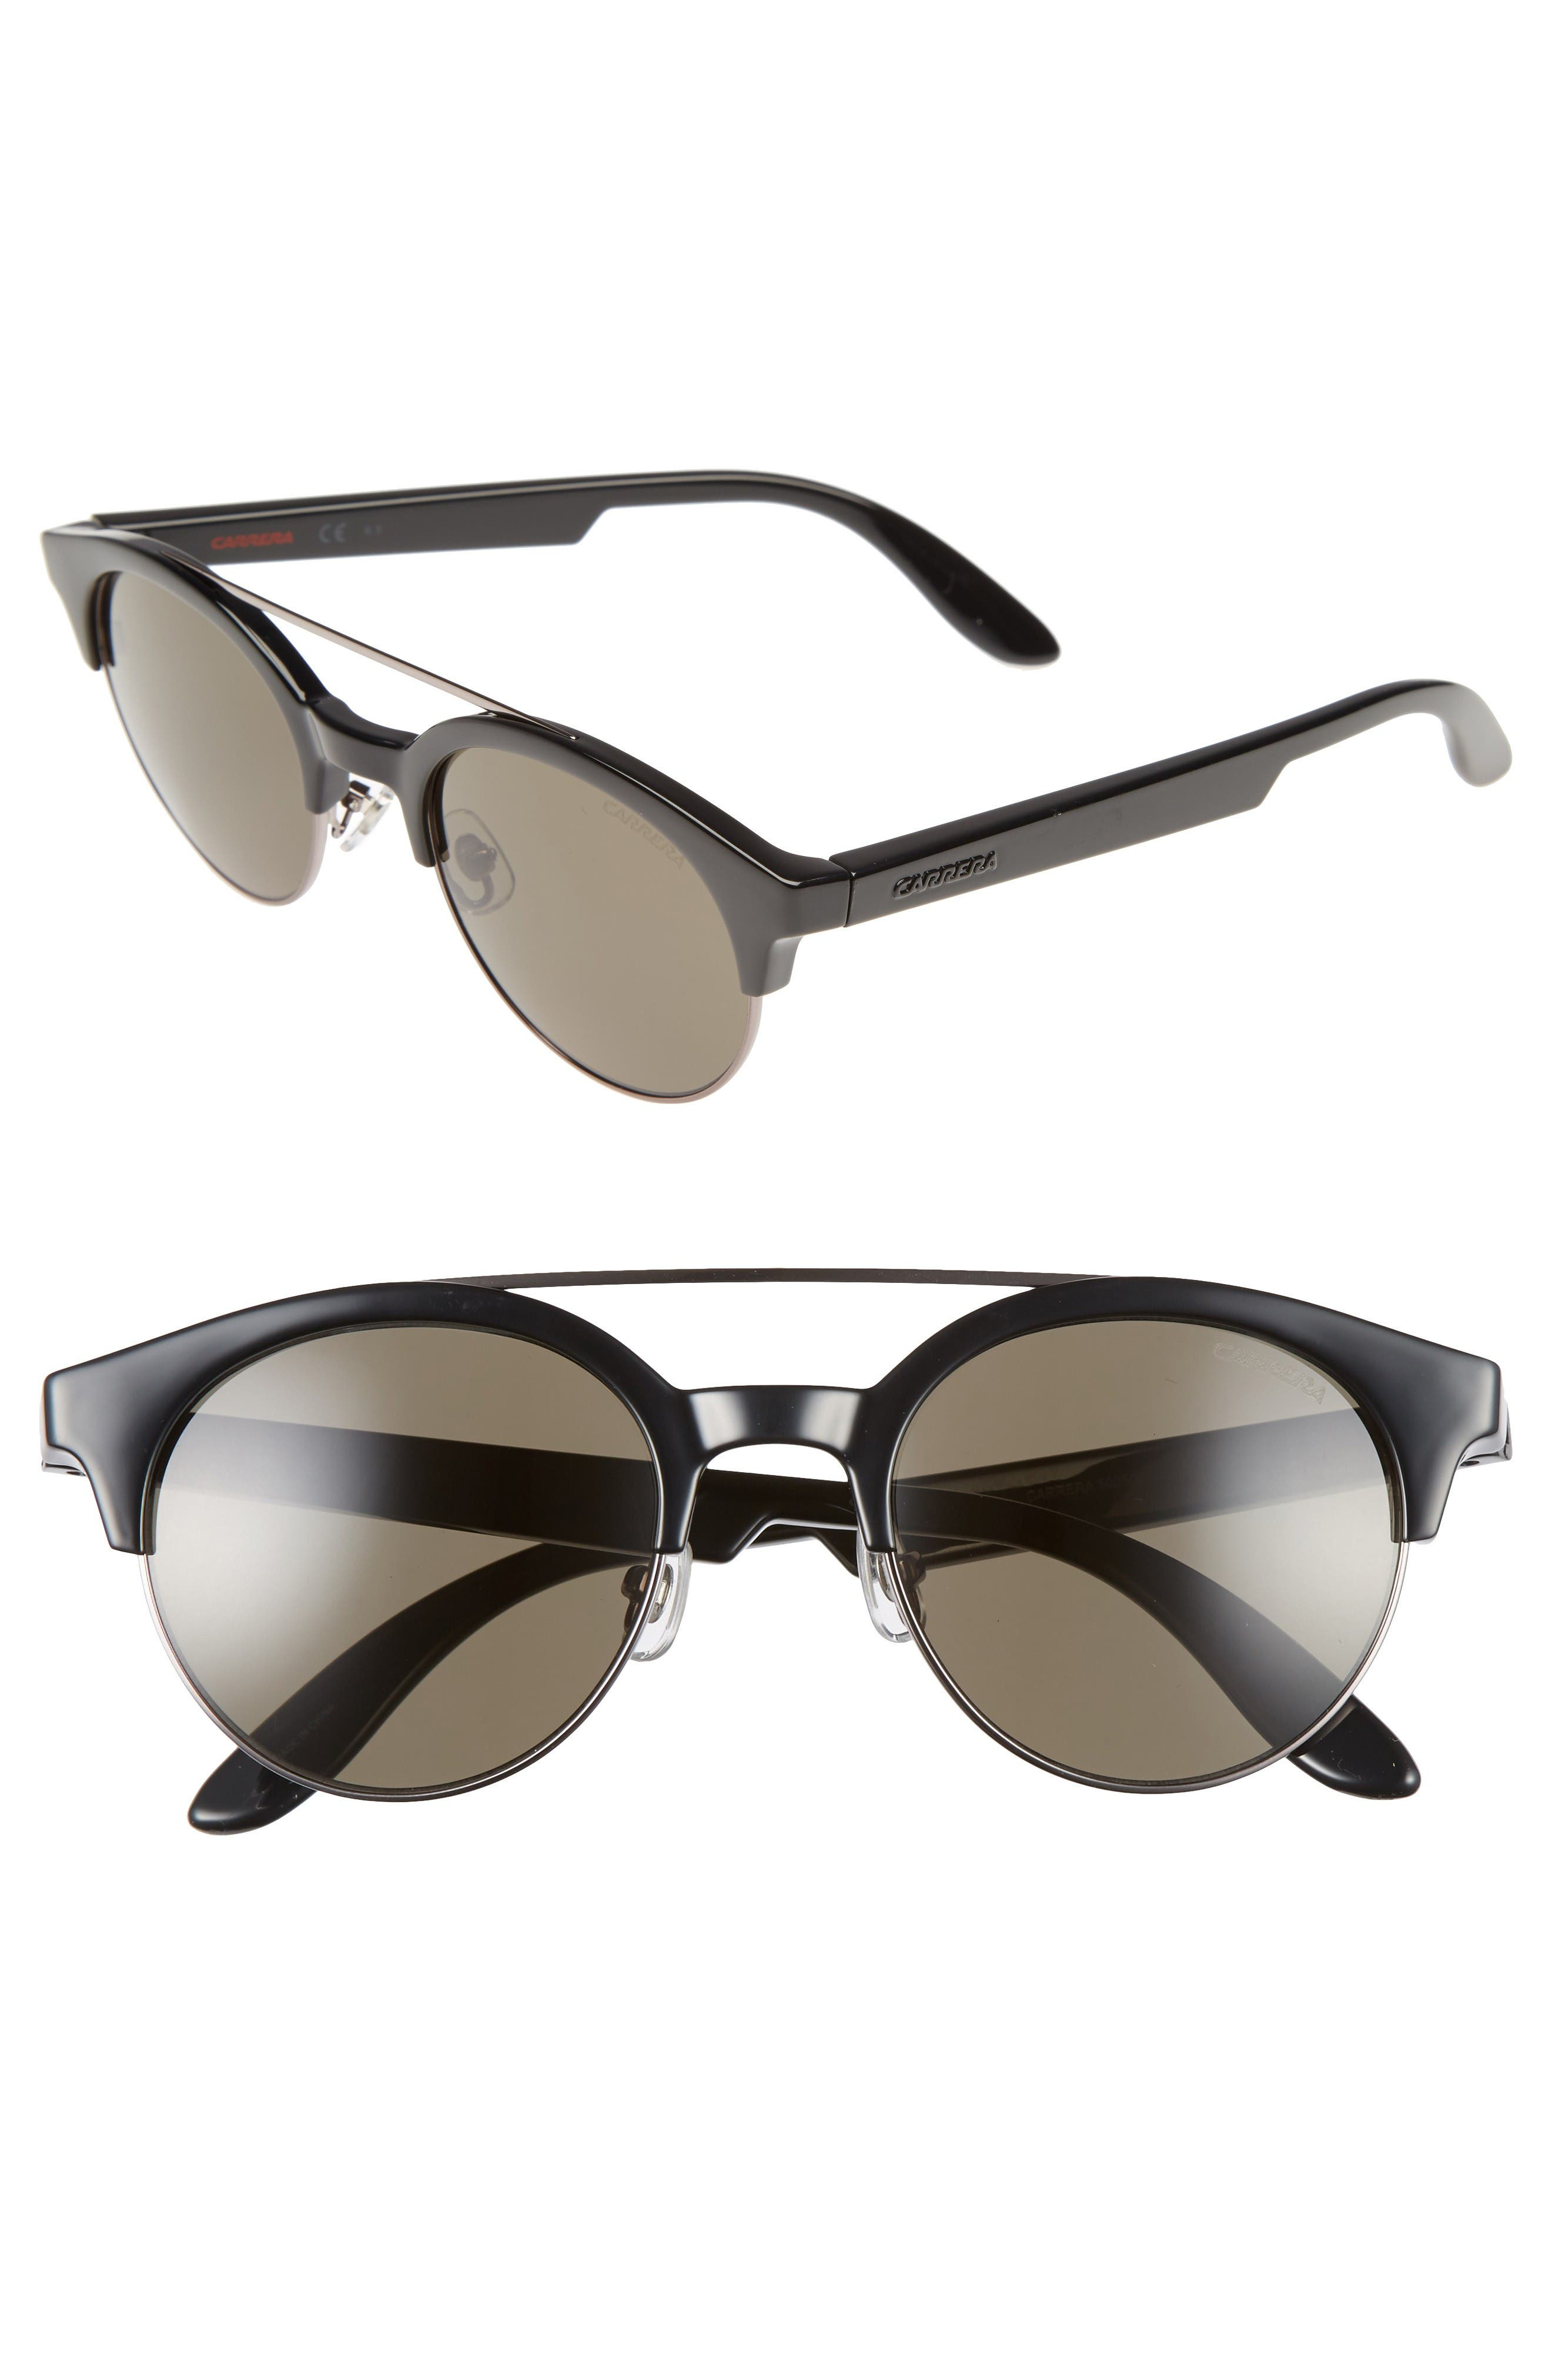 Alternate Image 1 Selected - Carrera Eyewear Retro 50mm Sunglasses